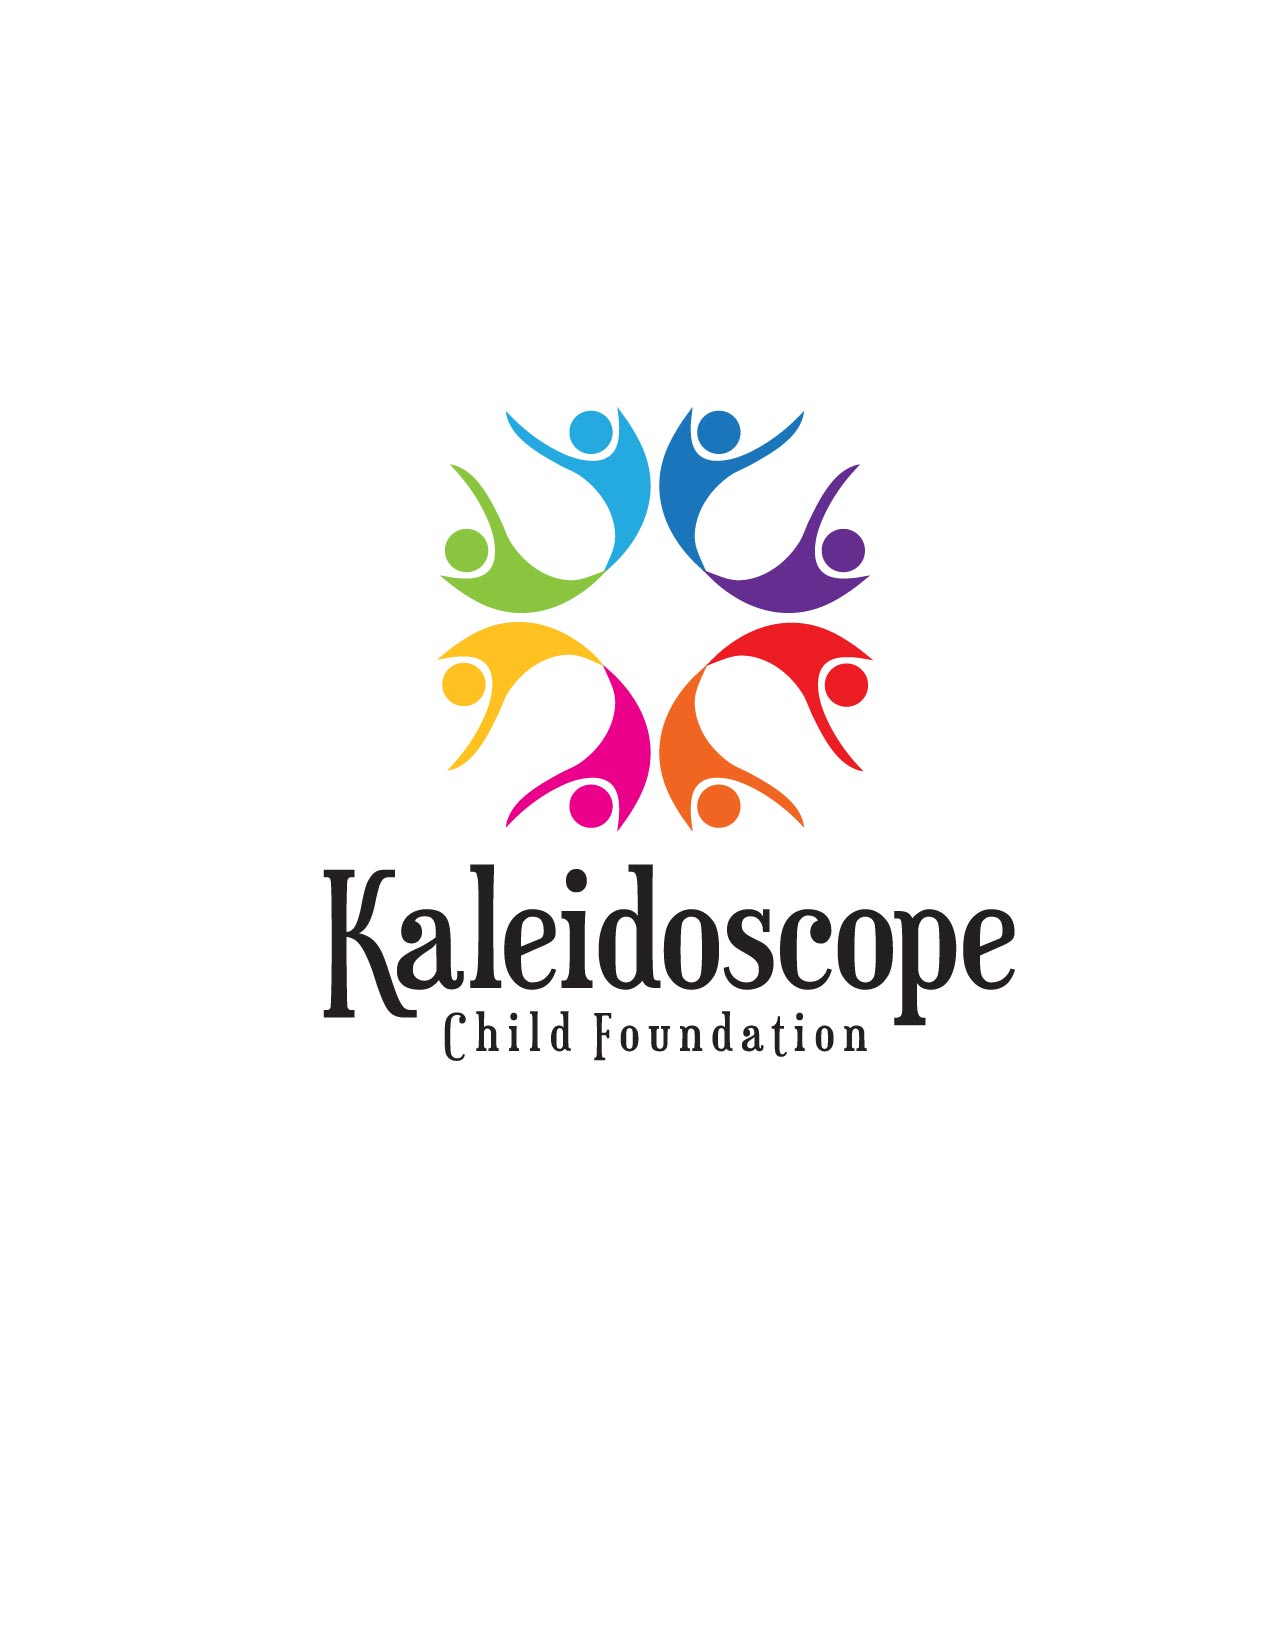 Kaeidoscope Child Foundation Logo